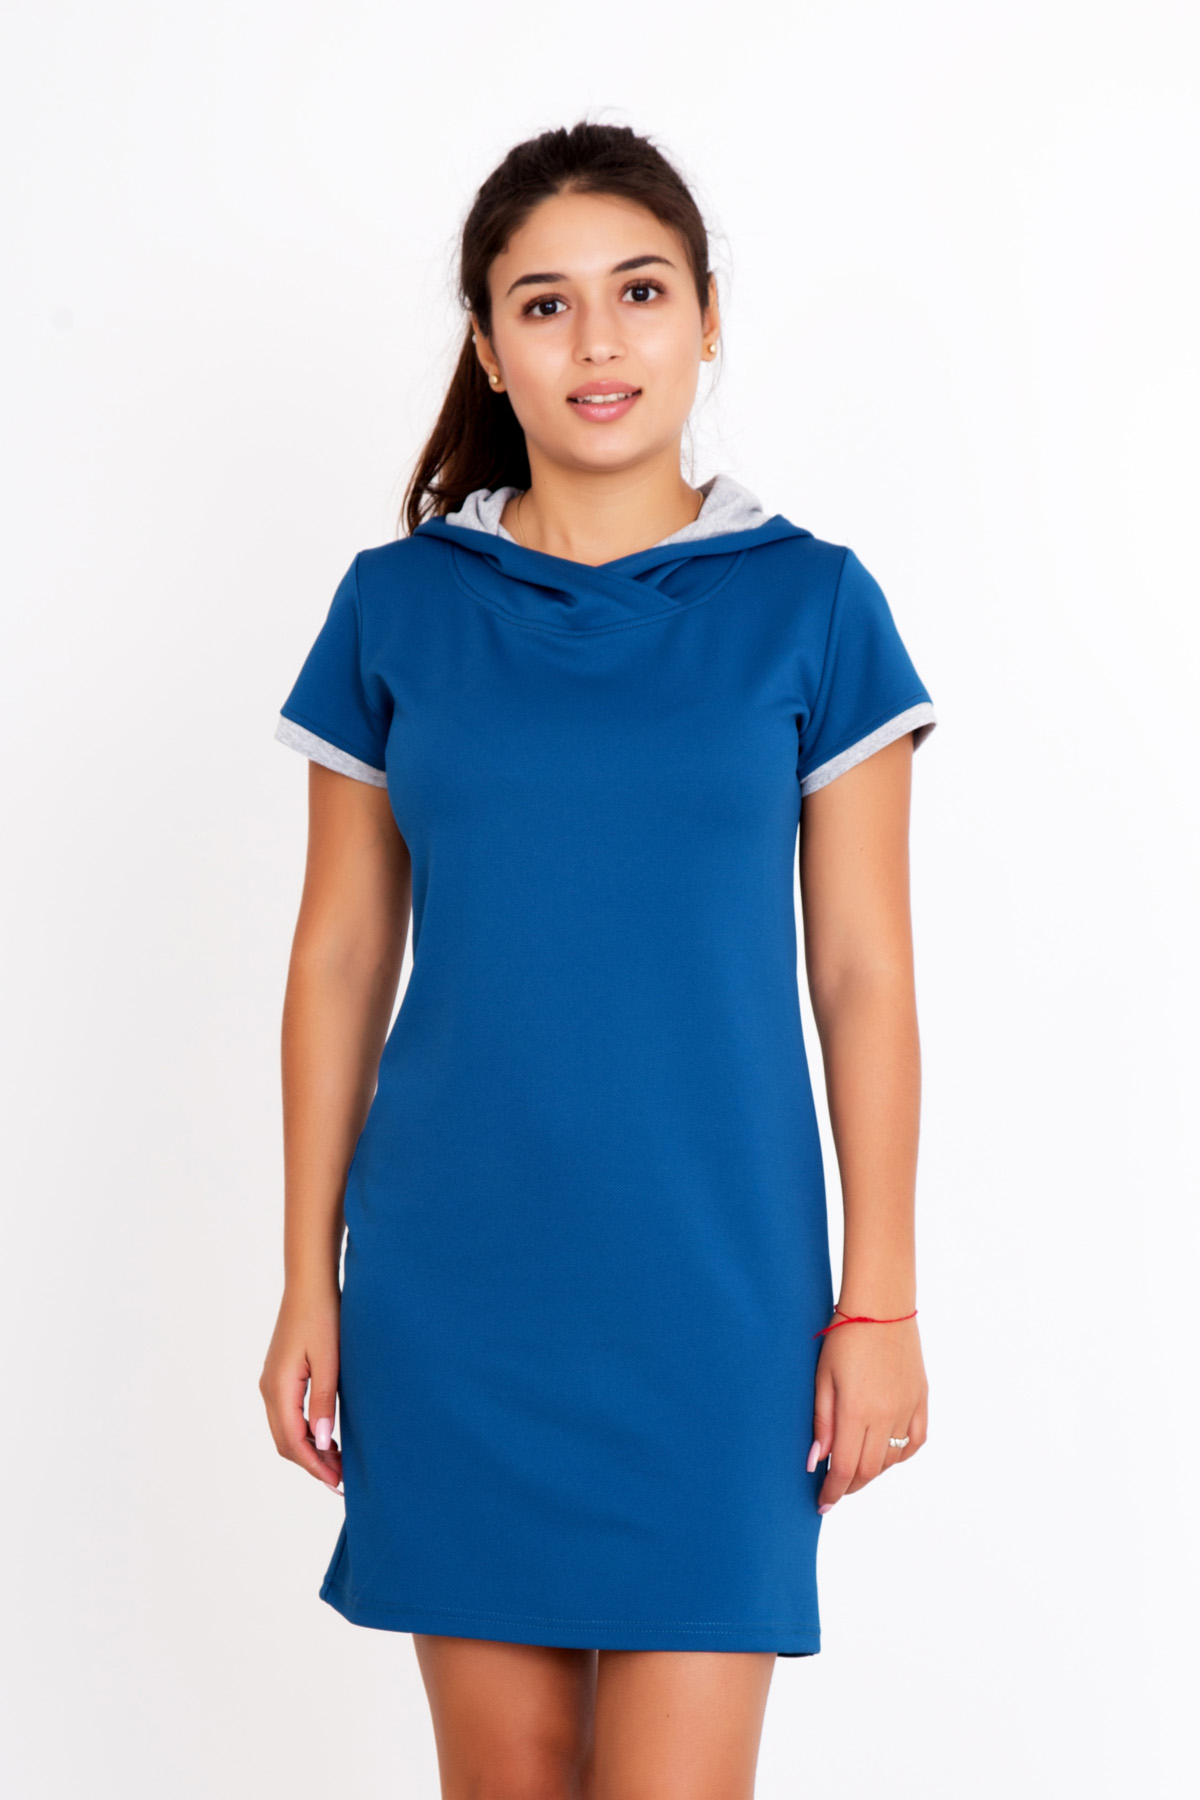 Жен. платье Янка р. 48Платья, туники<br>Обхват груди:96 см<br>Обхват талии:78 см<br>Обхват бедер:104 см<br>Длина по спинке:84 см<br>Рост:167 см<br><br>Тип: Жен. платье<br>Размер: 48<br>Материал: Кукуруза